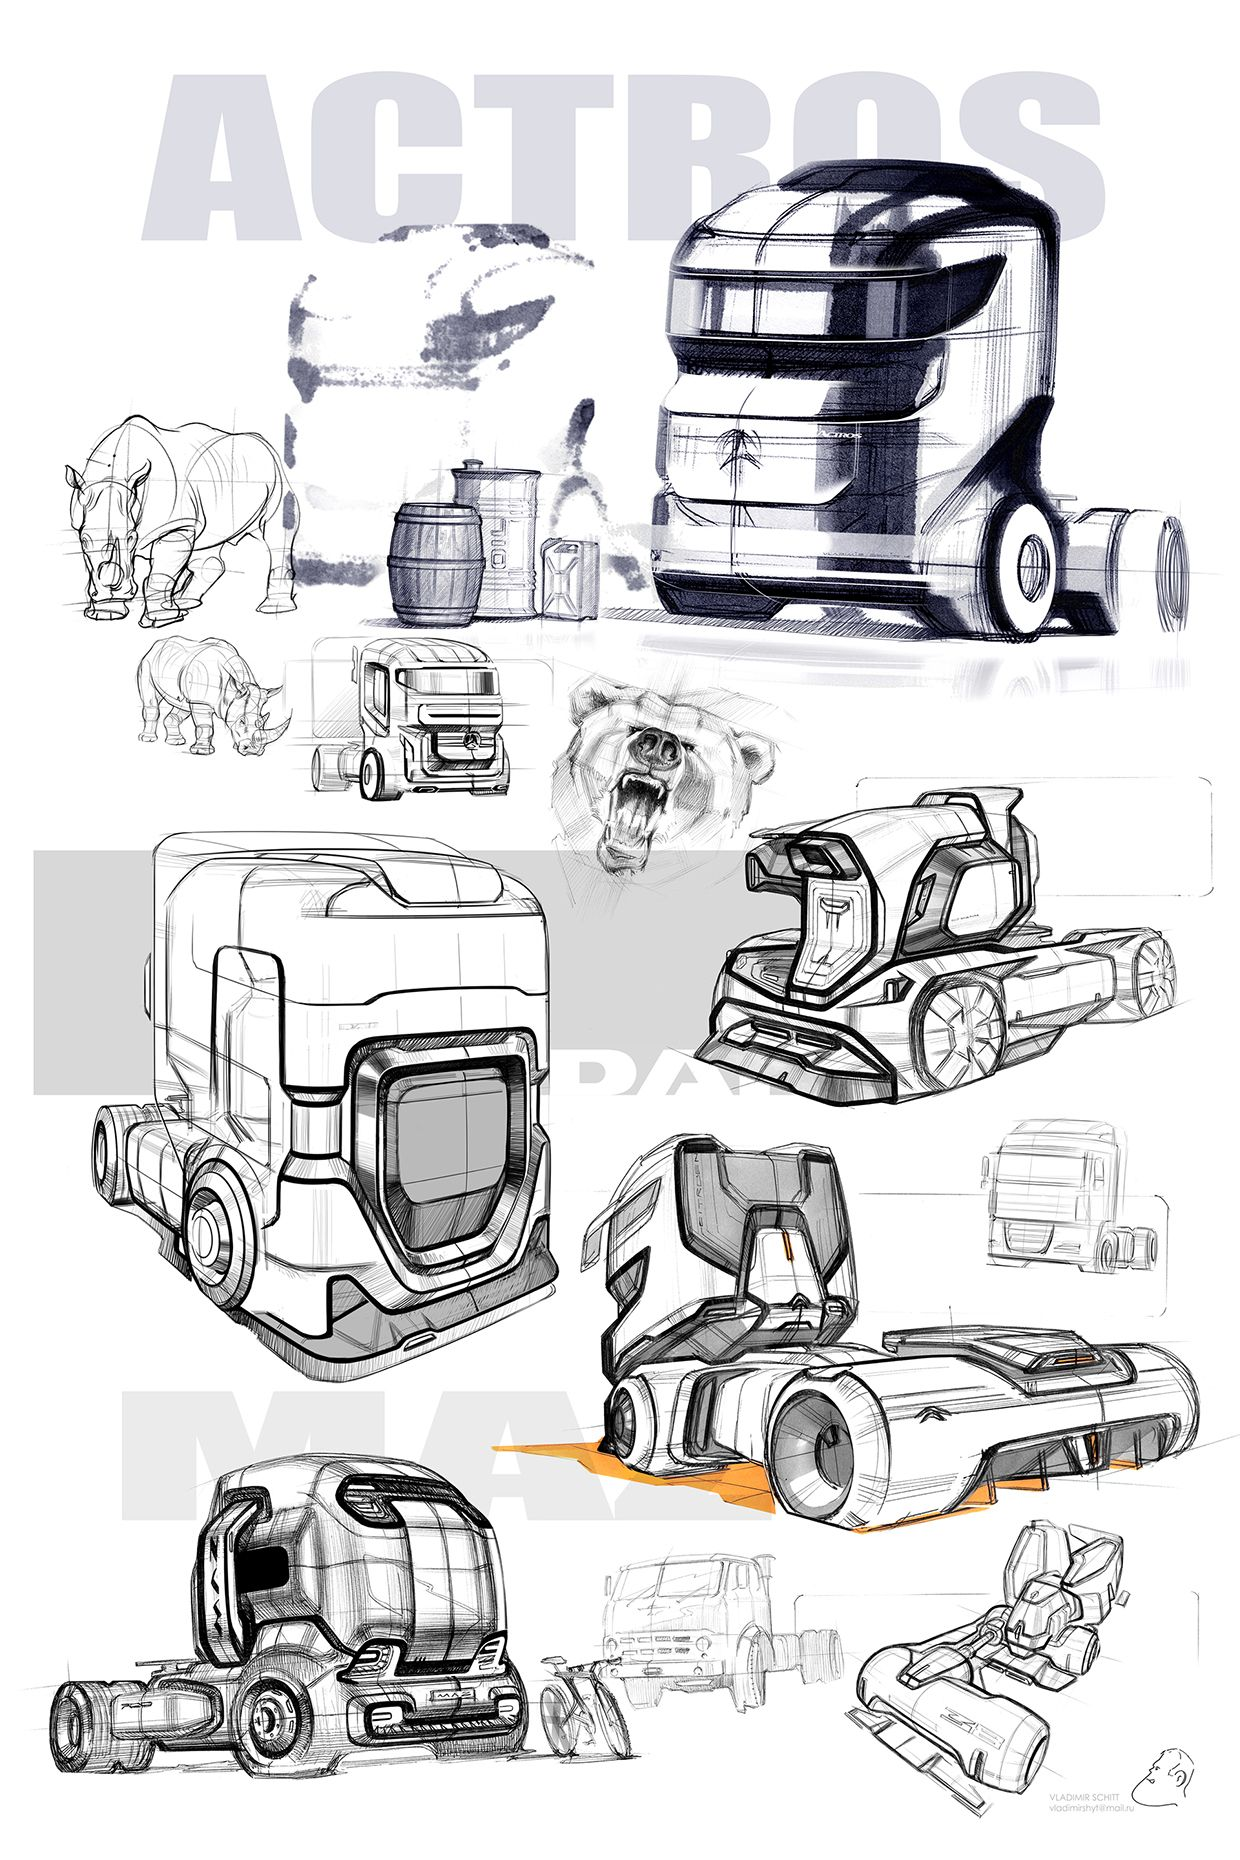 d6744956d91c17207e9e5f49bc904e7c.jpg (1240×1860) | truck | Pinterest ...